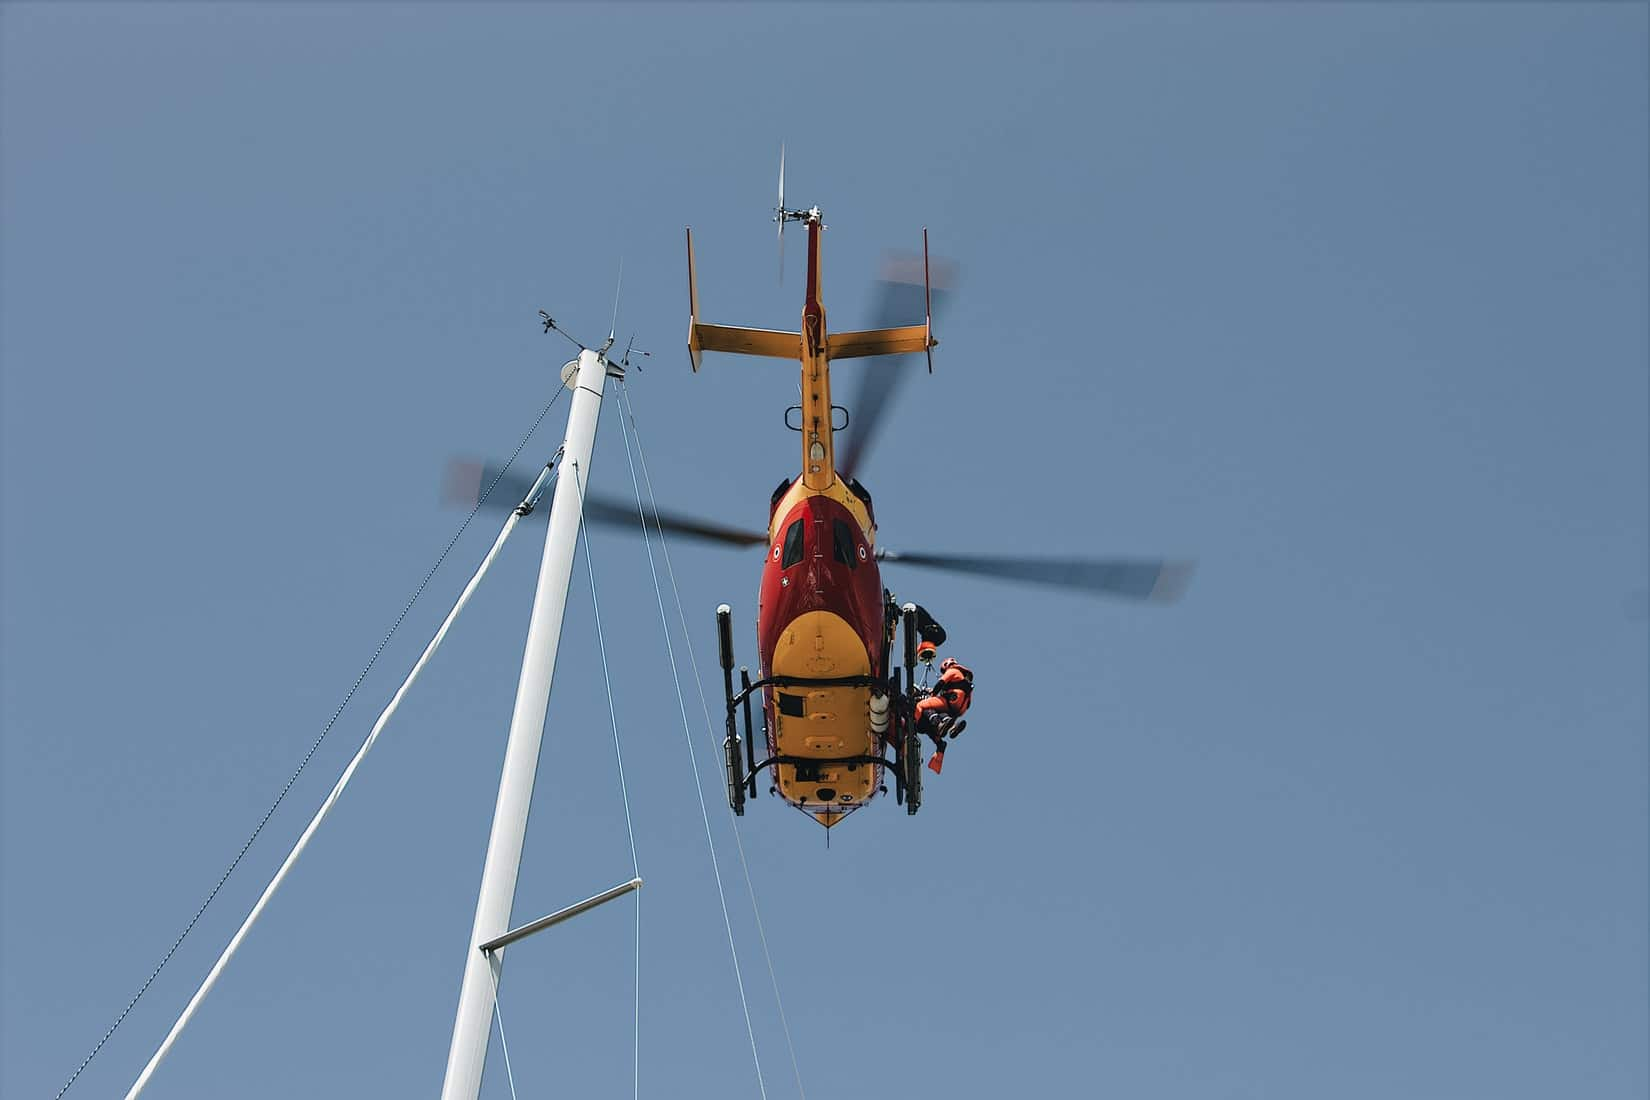 Terbang Terlalu Rendah, Pilot Helikopter Kobe Bryant Sempat diperingatan. Photo by Mael BALLAND https://unsplash.com/photos/R0EEq4pFRJg